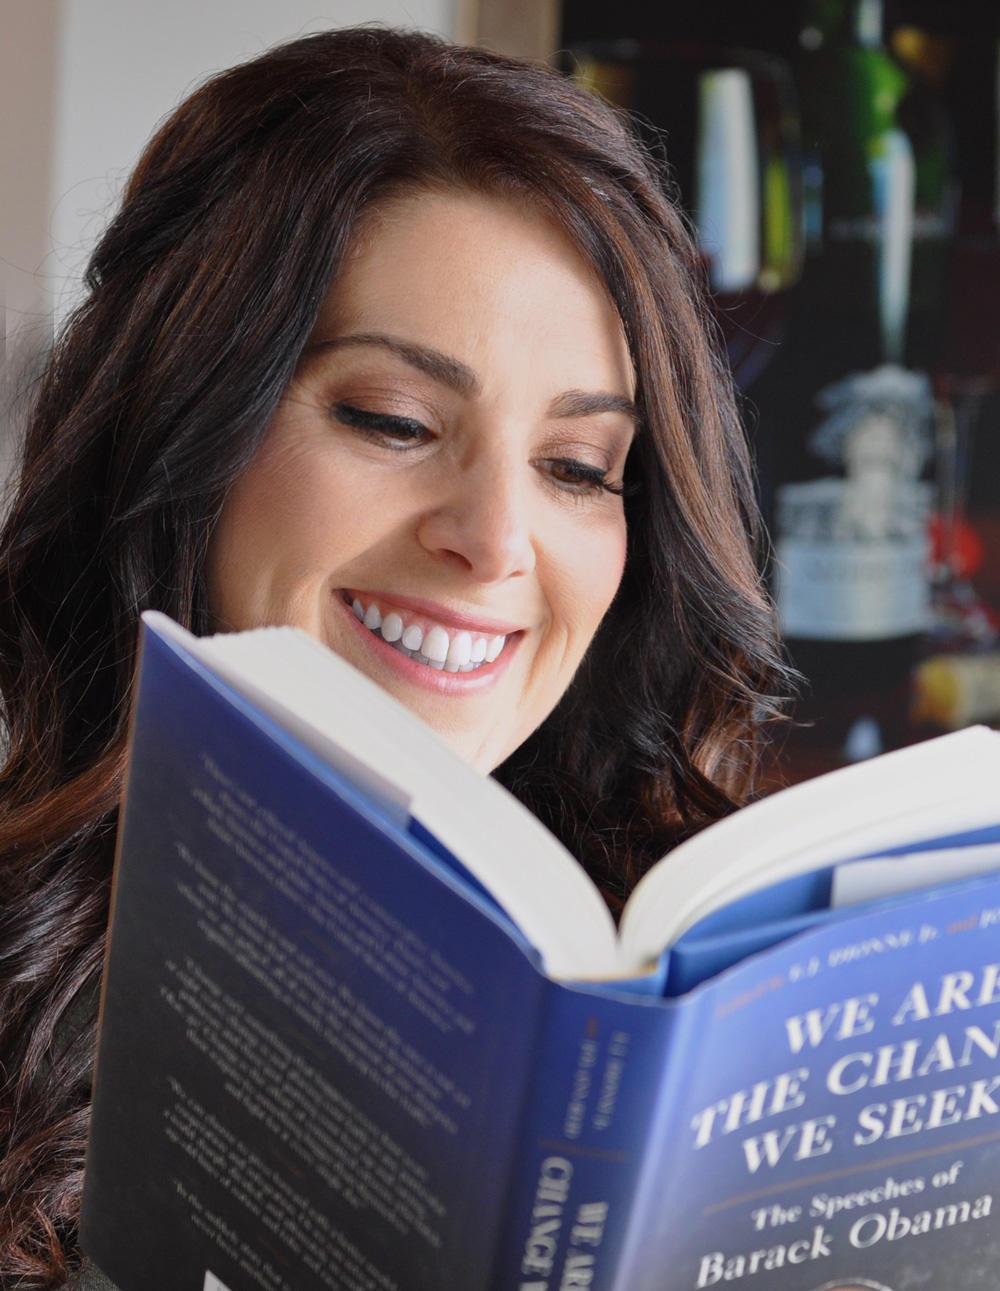 Ellie Shefi Resources to Empower the Next Generation